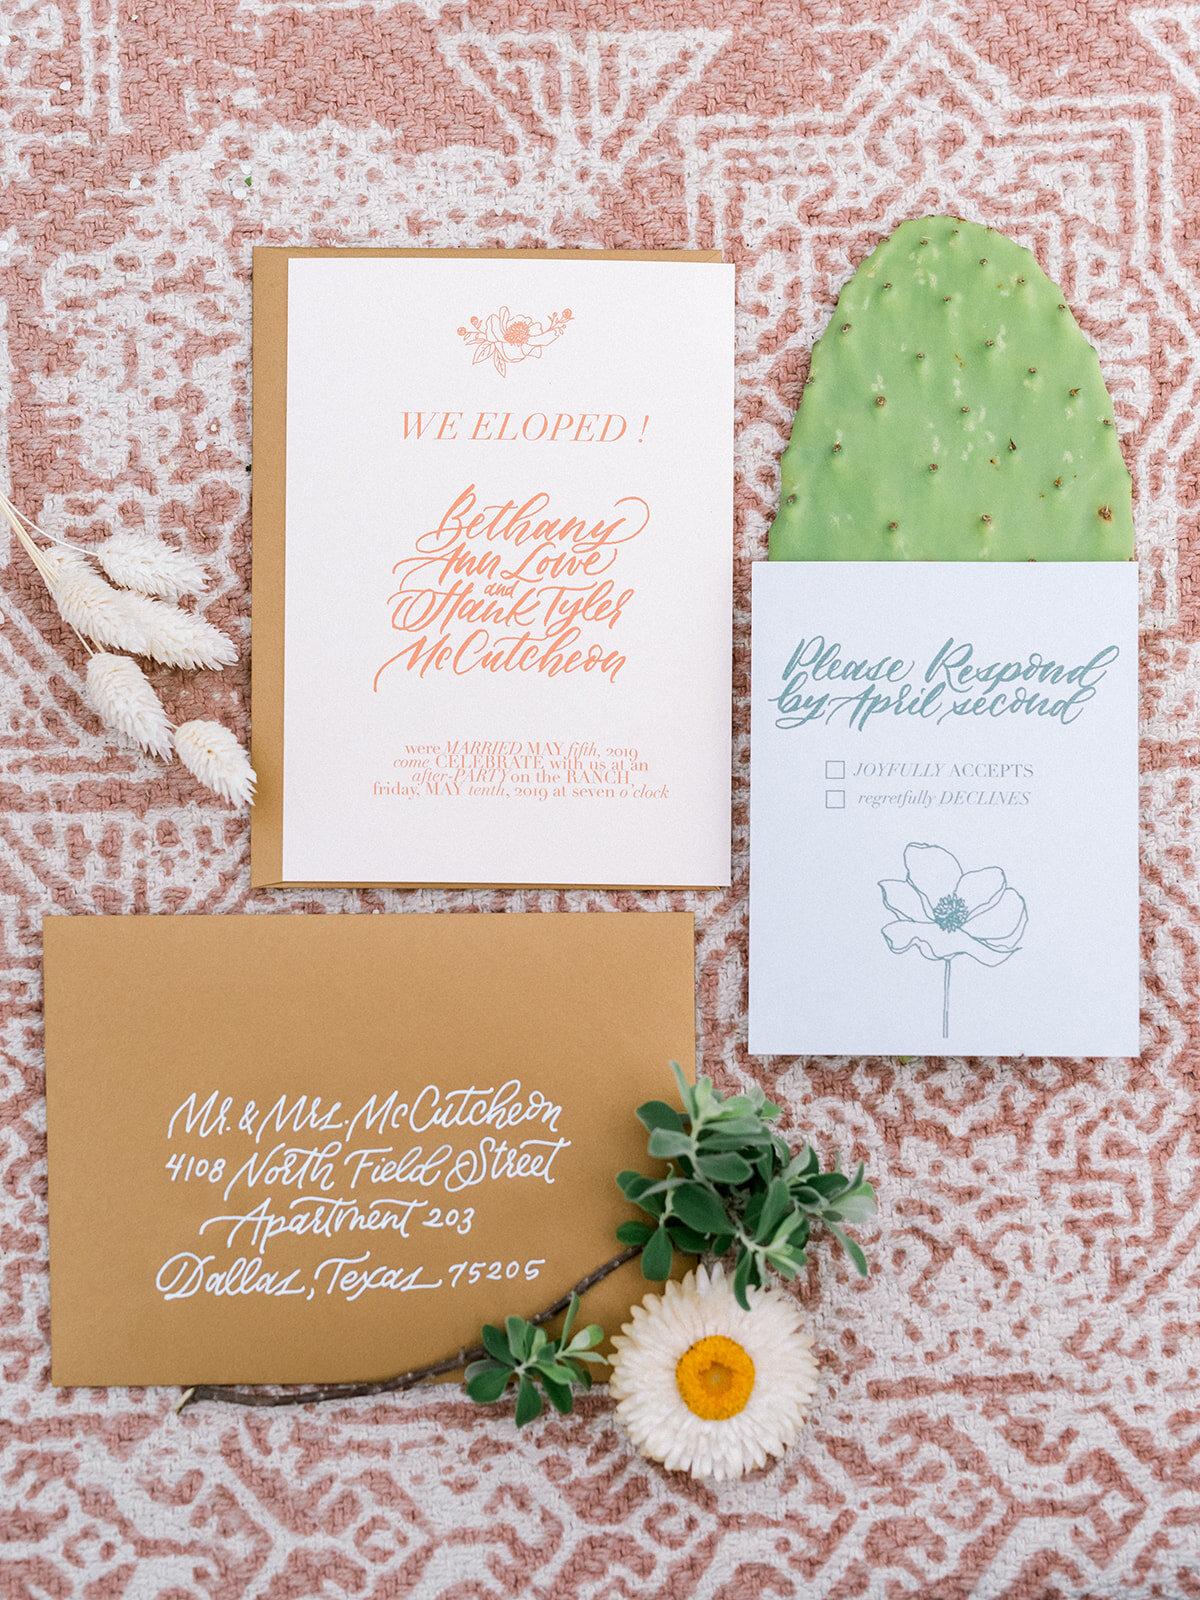 Elegant Country Wedding Invitations